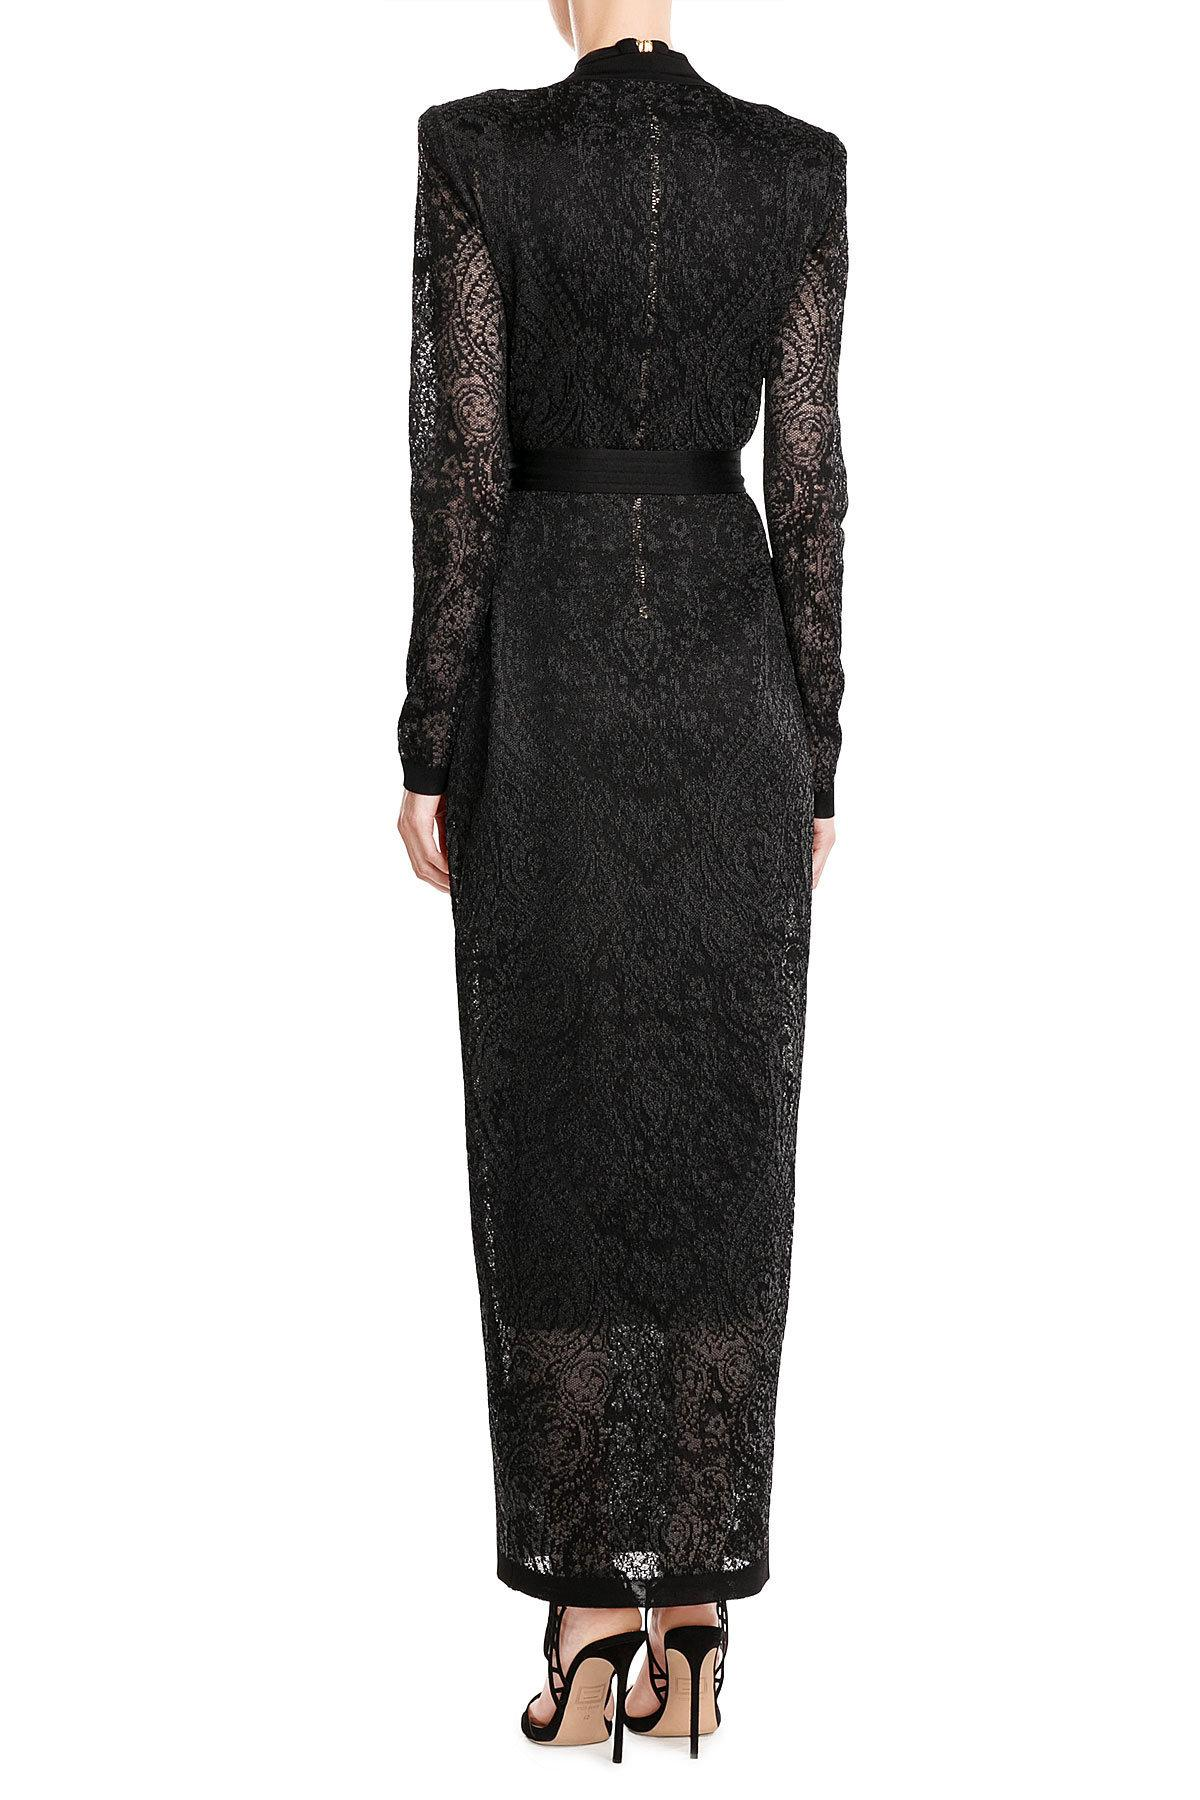 Lyst Balmain Floor Length Knit Cardigan In Black